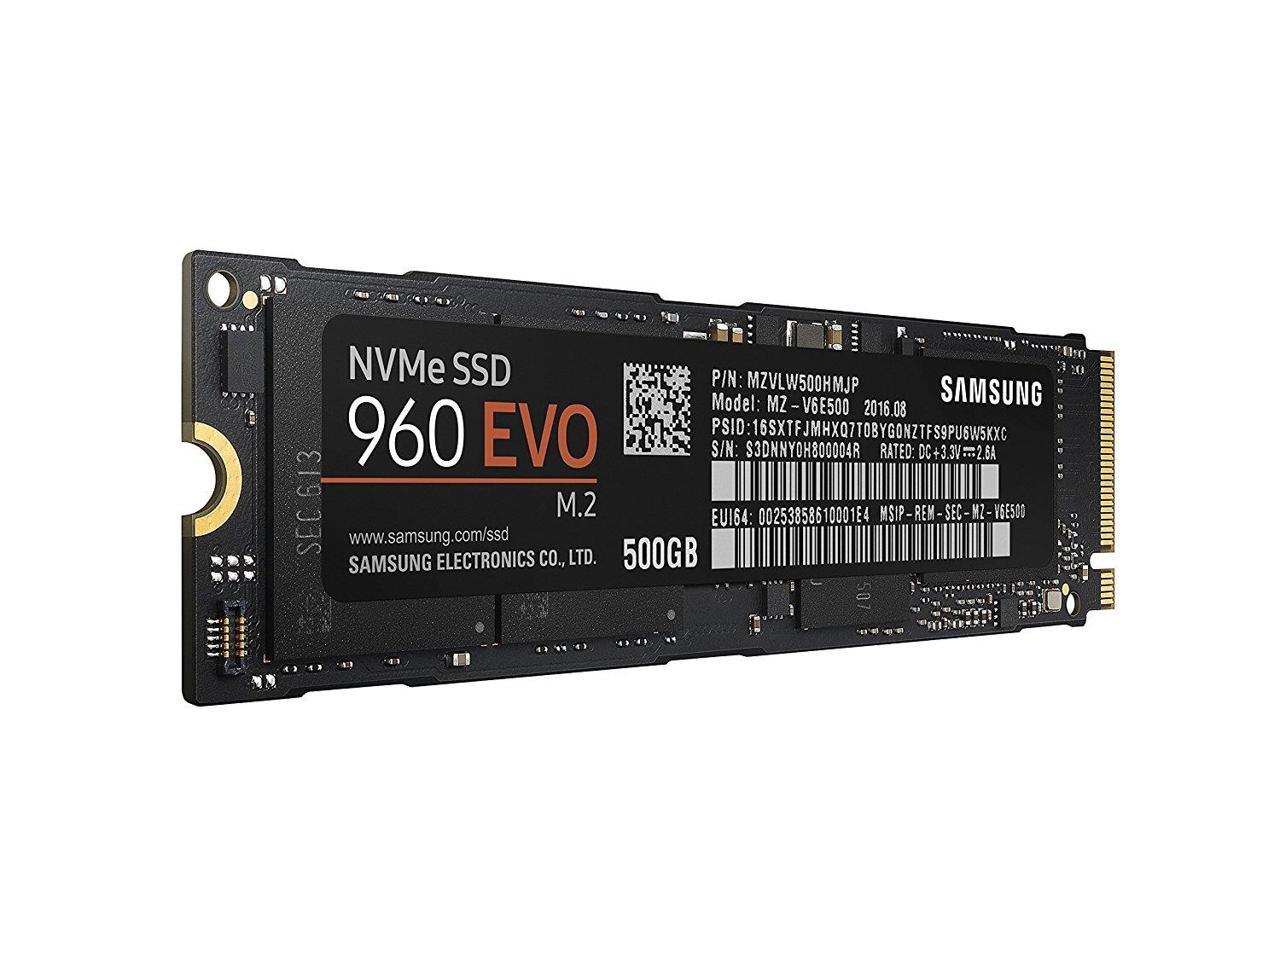 Samsung SSD 960 EVO 500GB M.2 2280 PCIe Gen3 x4 PCI-Express 3.0 x4 NVMe 3D V-NAND Internal Solid State Drive MZ-V6E500BW